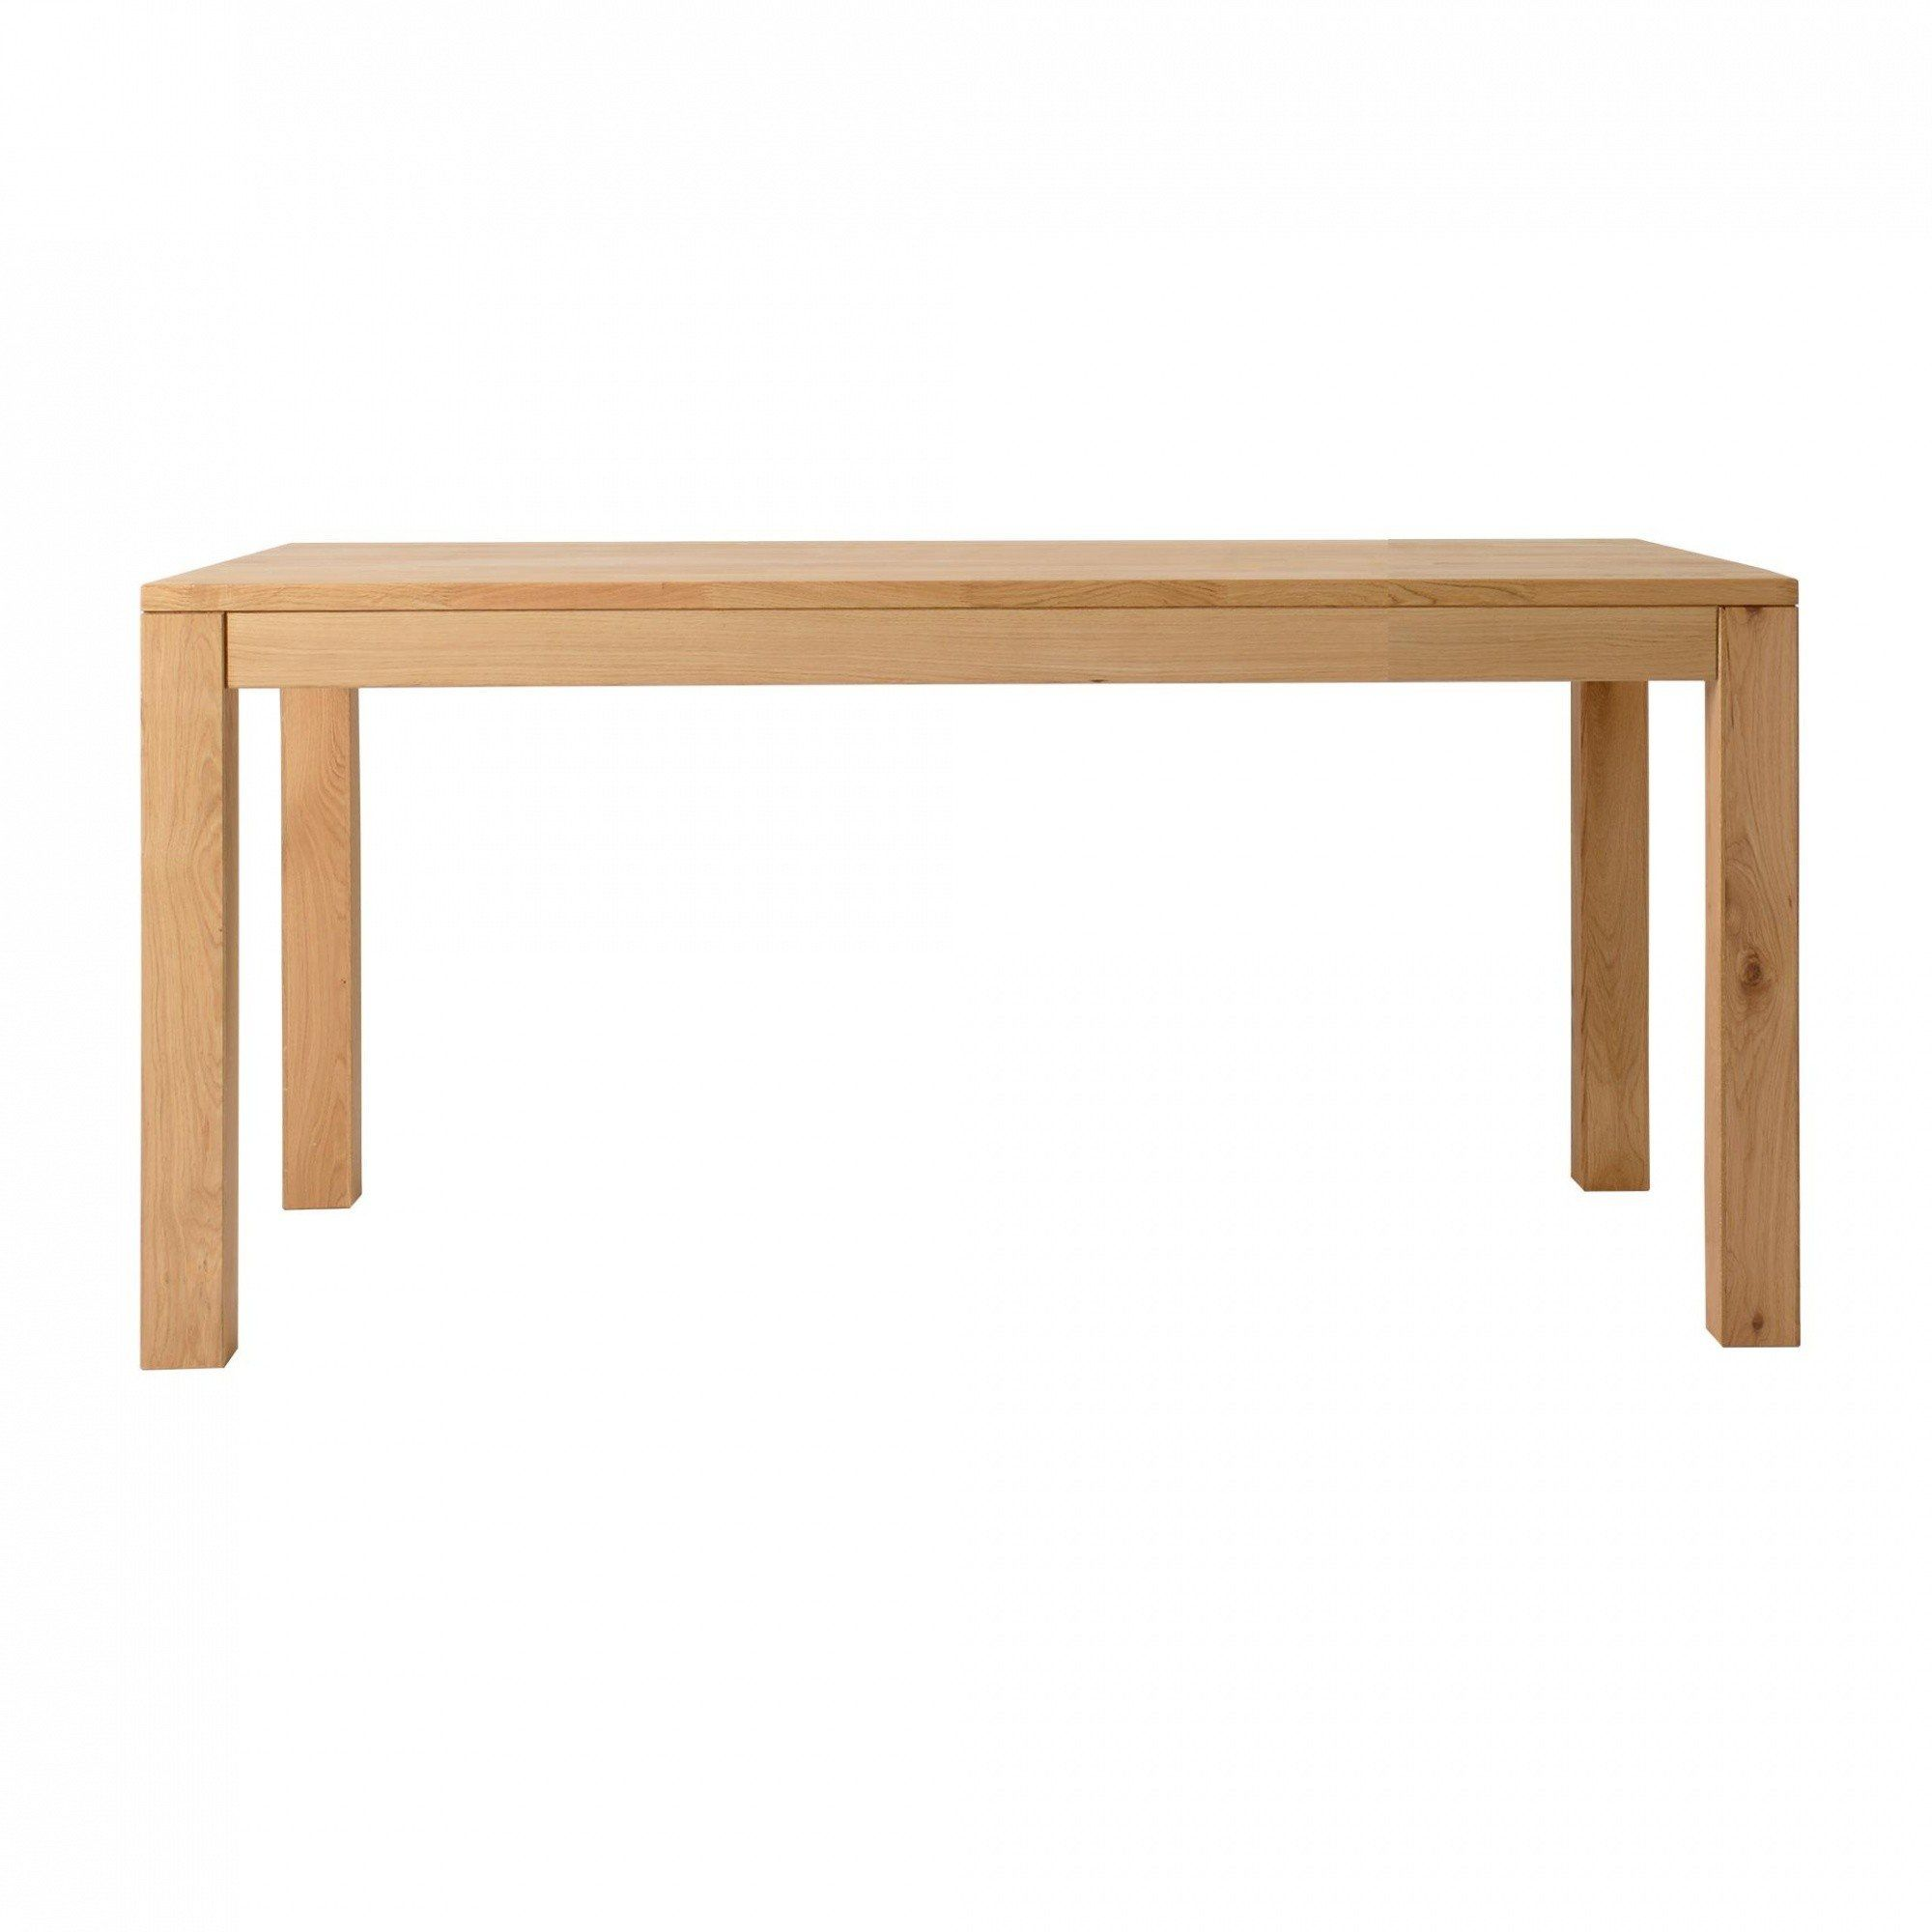 Cana table de salle manger bois massif jan kurtz - Table de salle a manger en bois massif ...